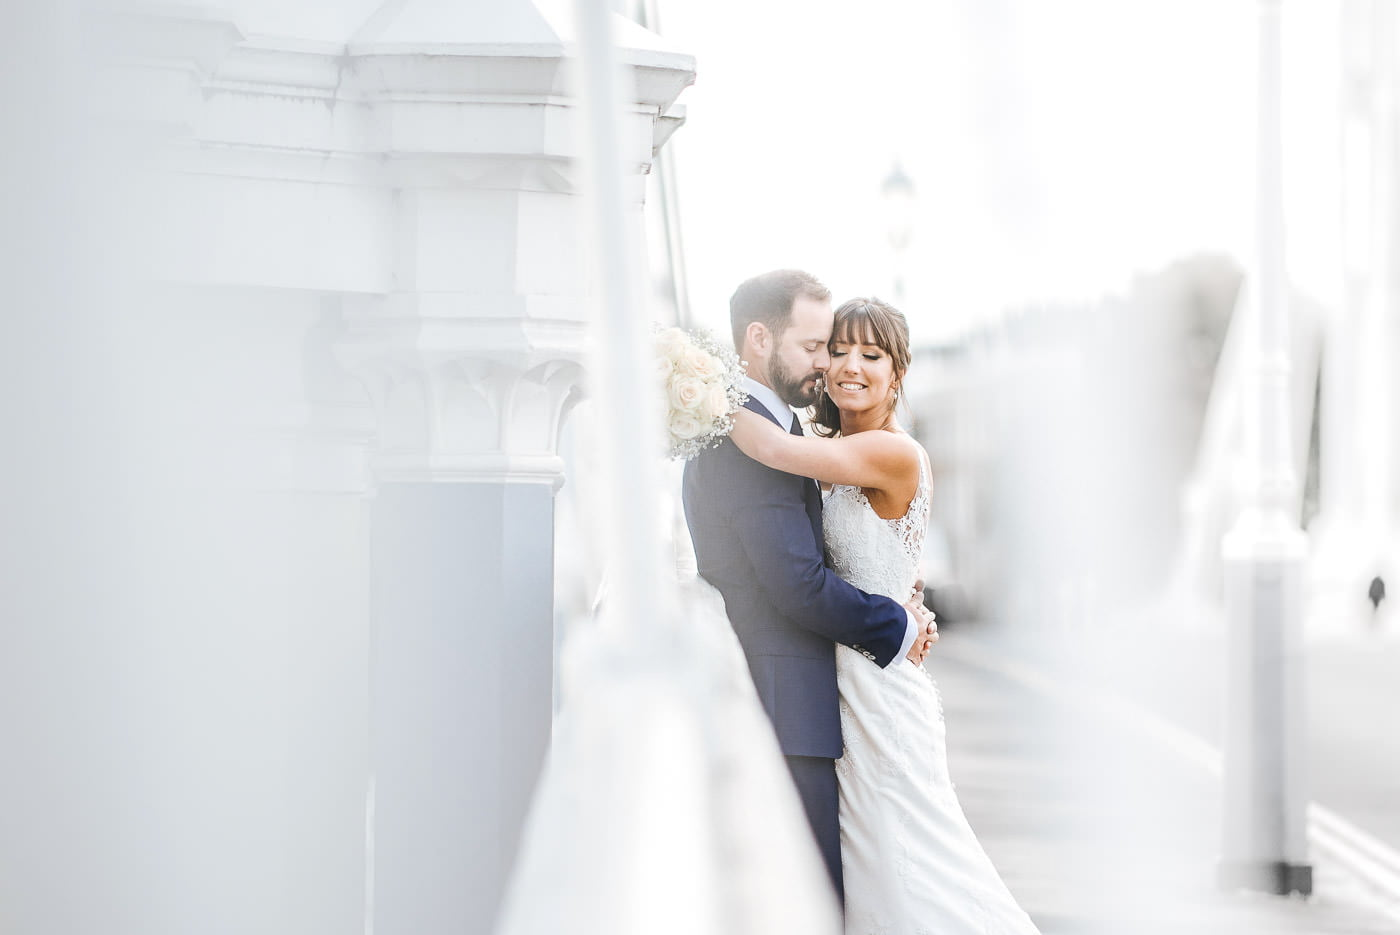 Celsea old town hall wedding photos bride and groom shoot on albert bridge